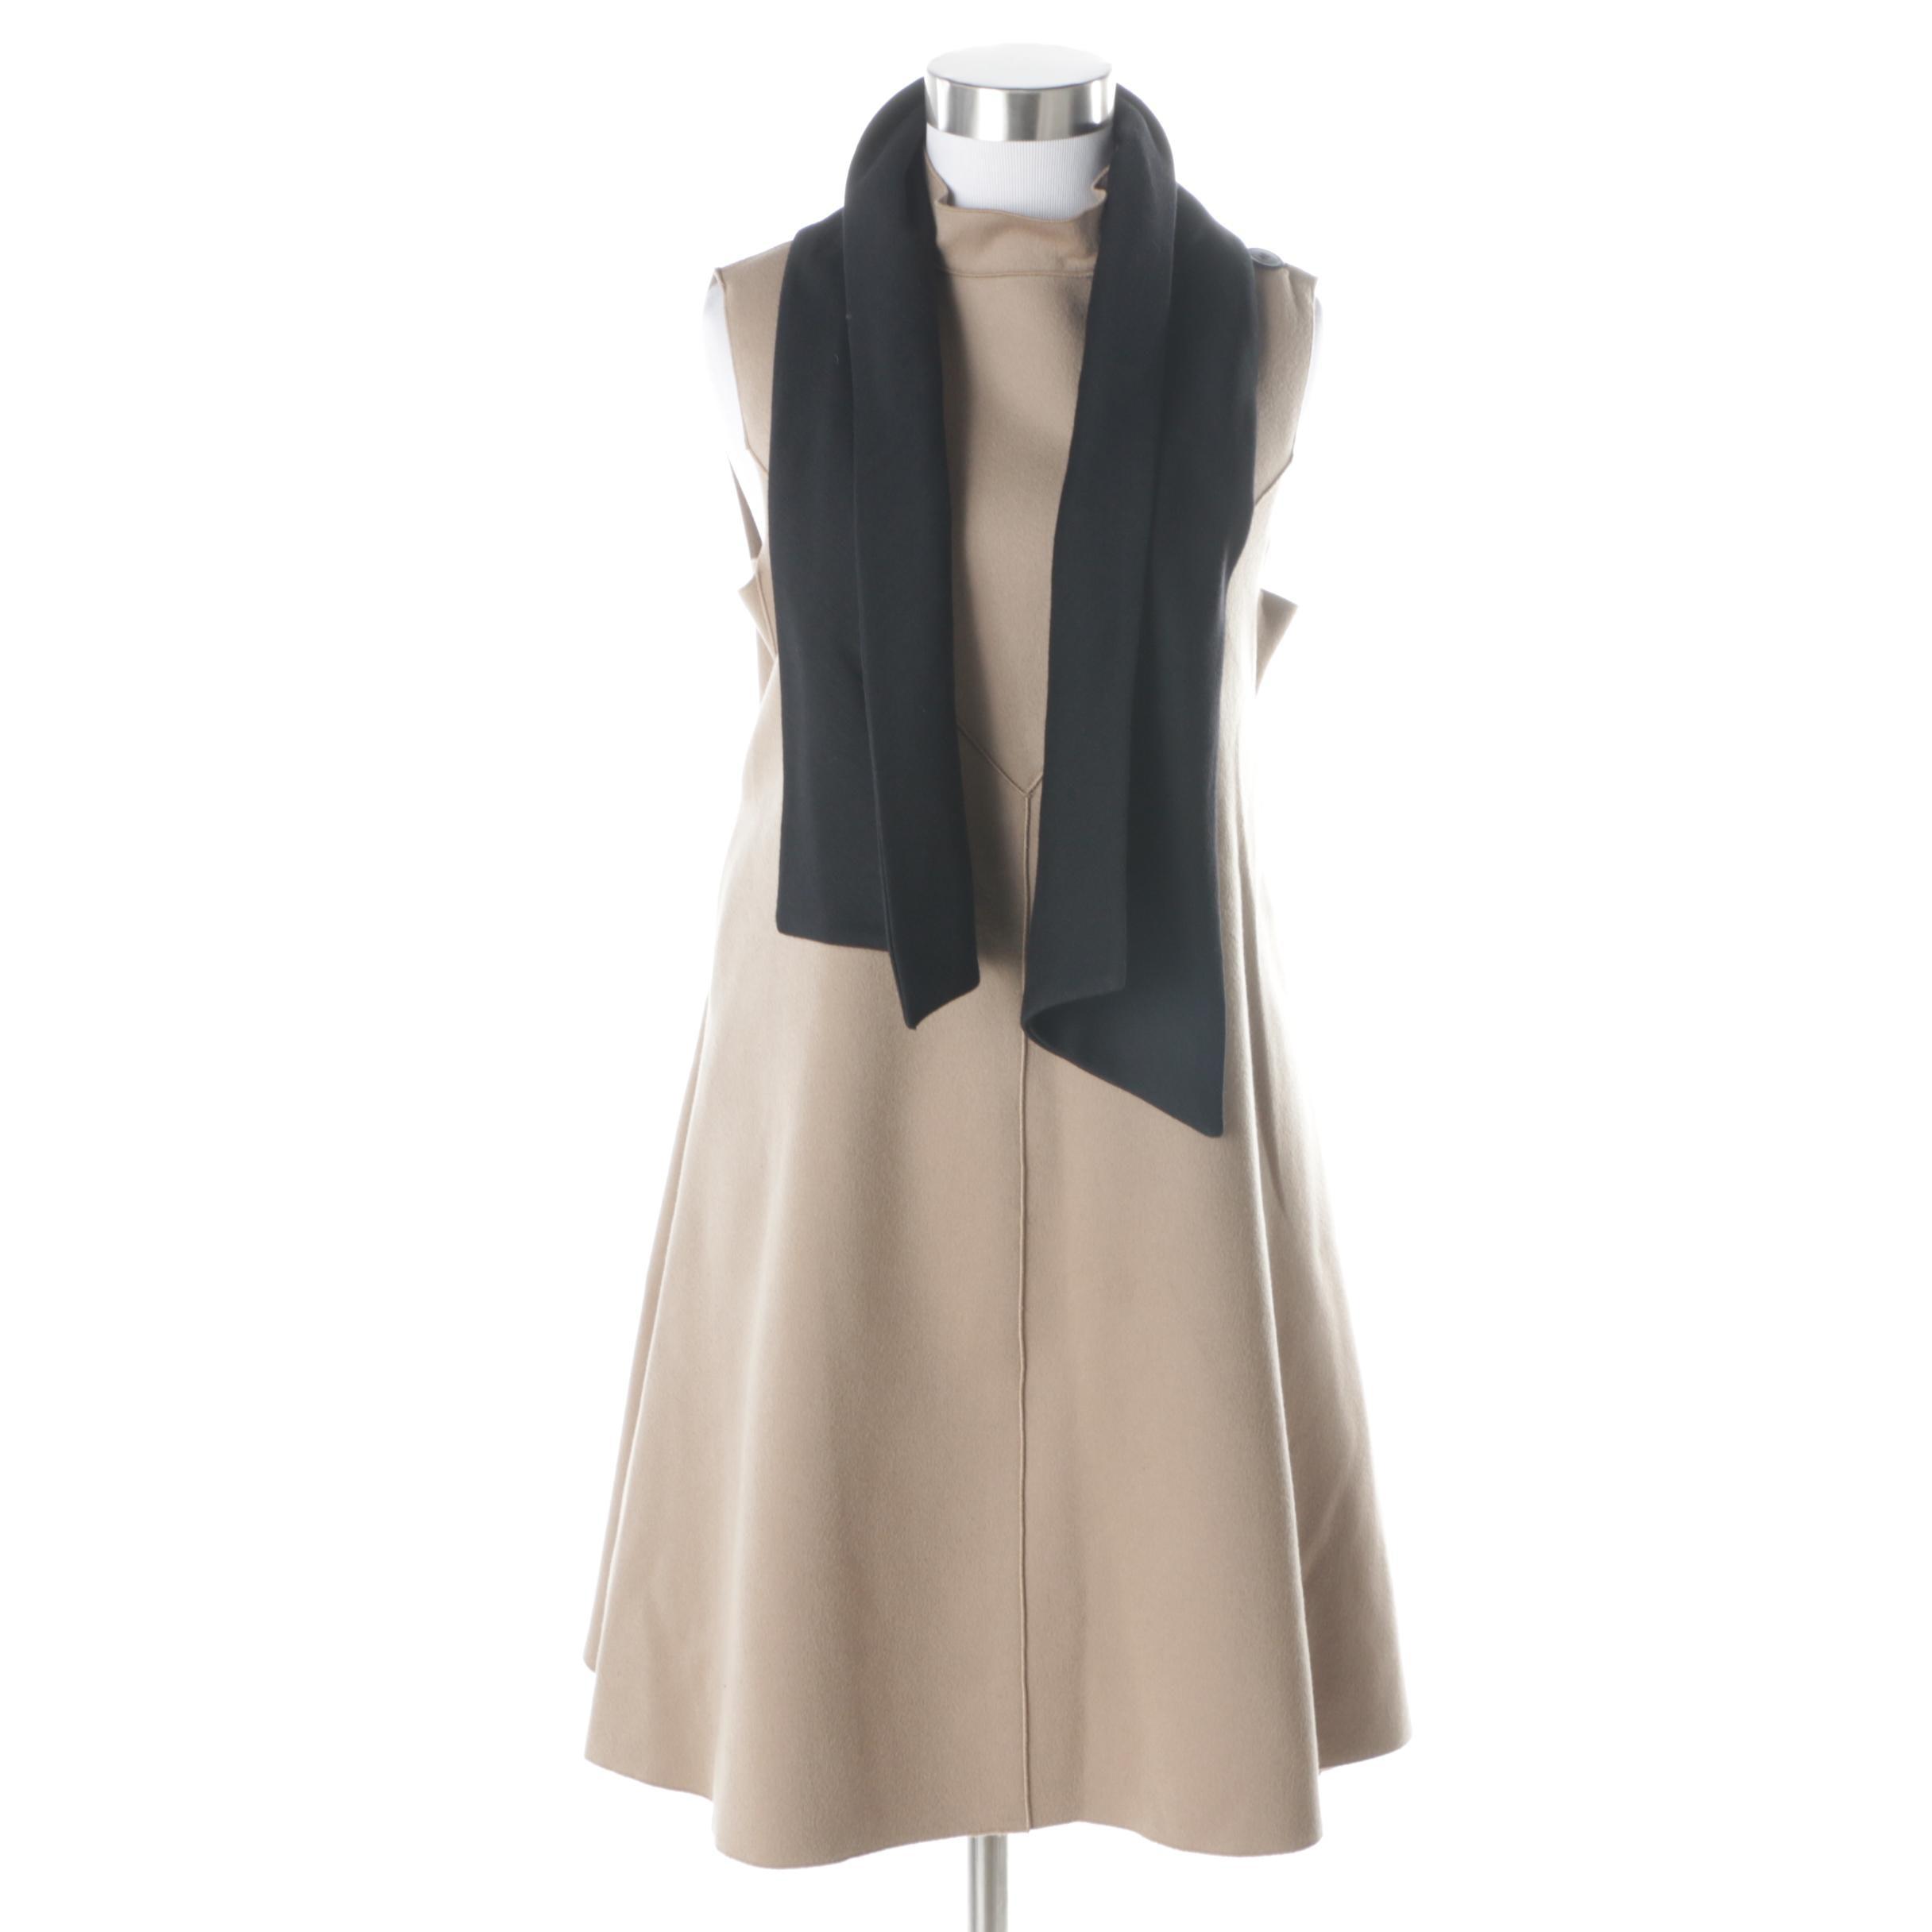 Derek Lam Cashmere Trapeze Dress